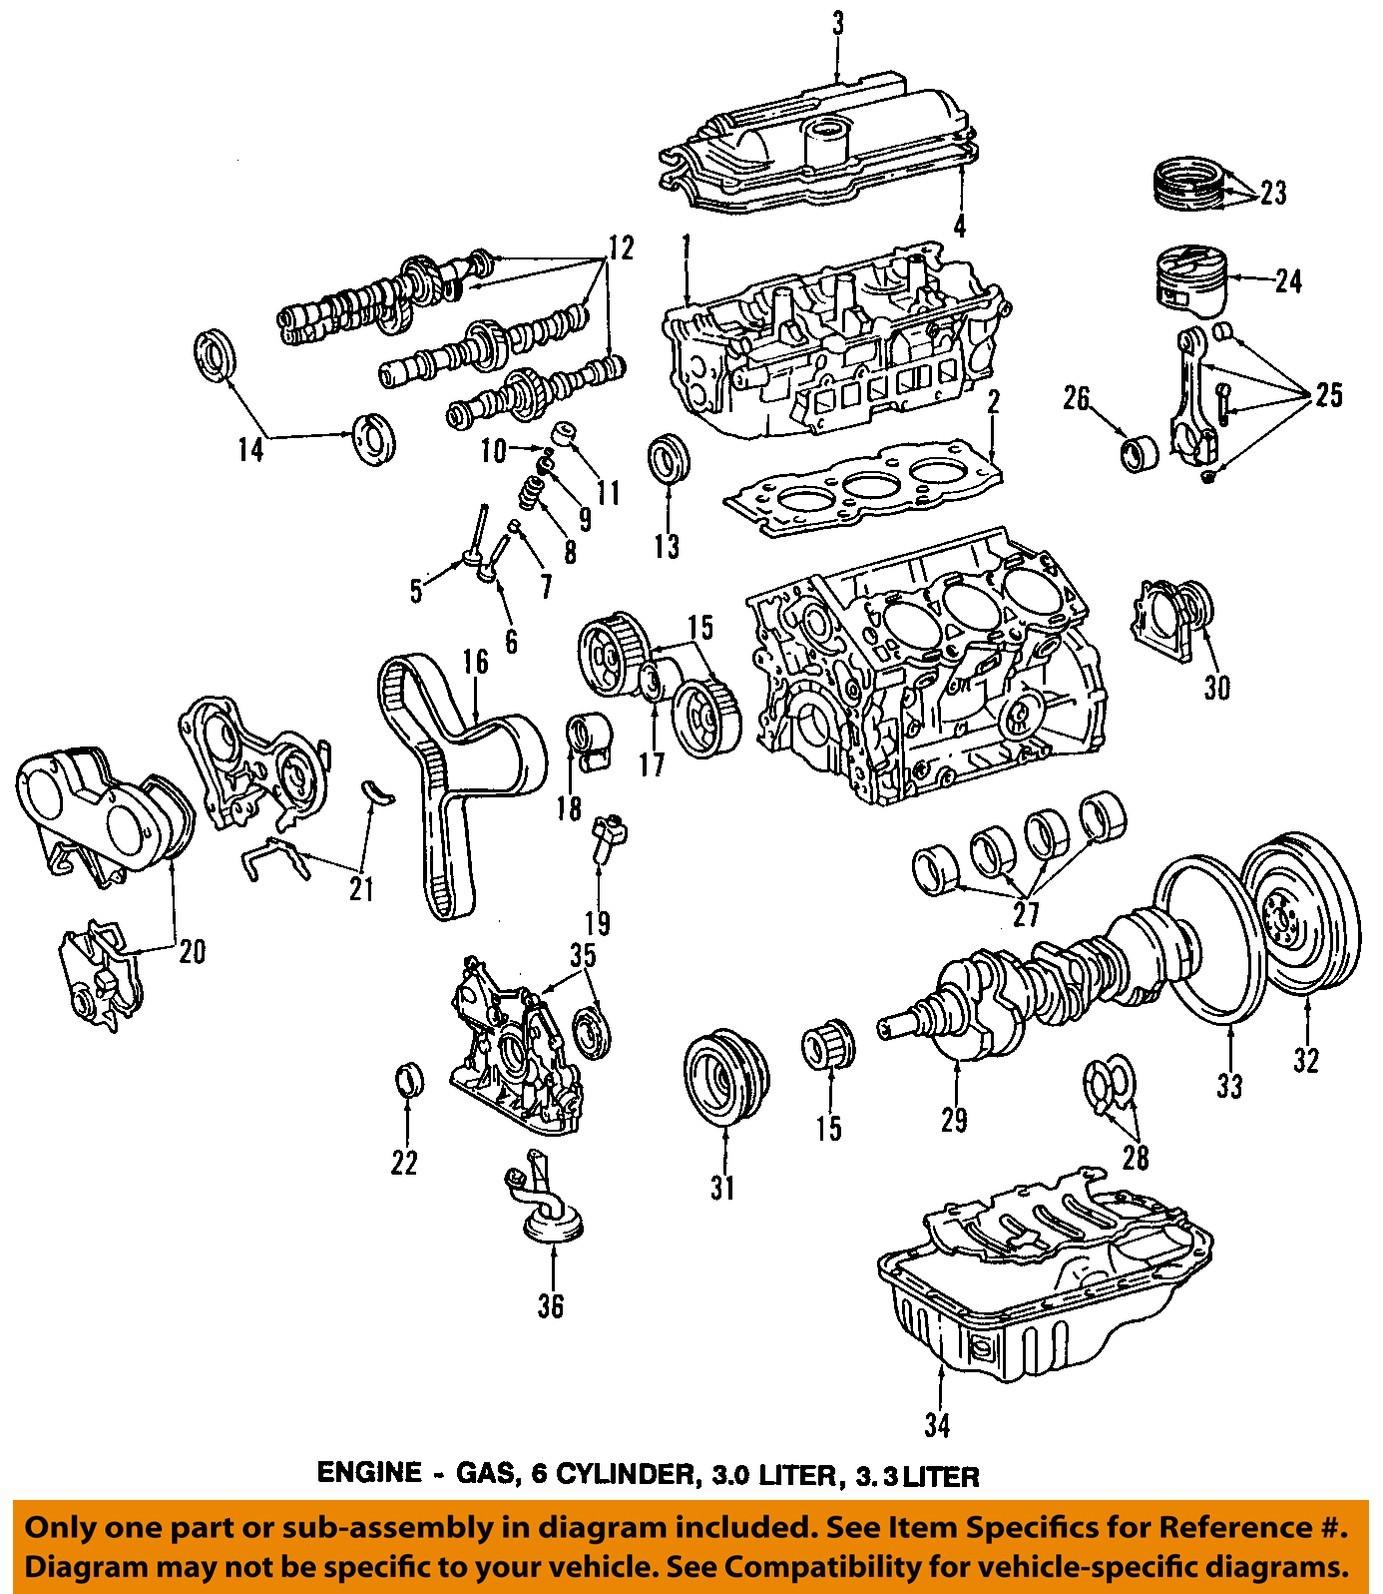 hight resolution of wrg 5047 1996 toyota camry engine diagram 1996 camry engine diagram